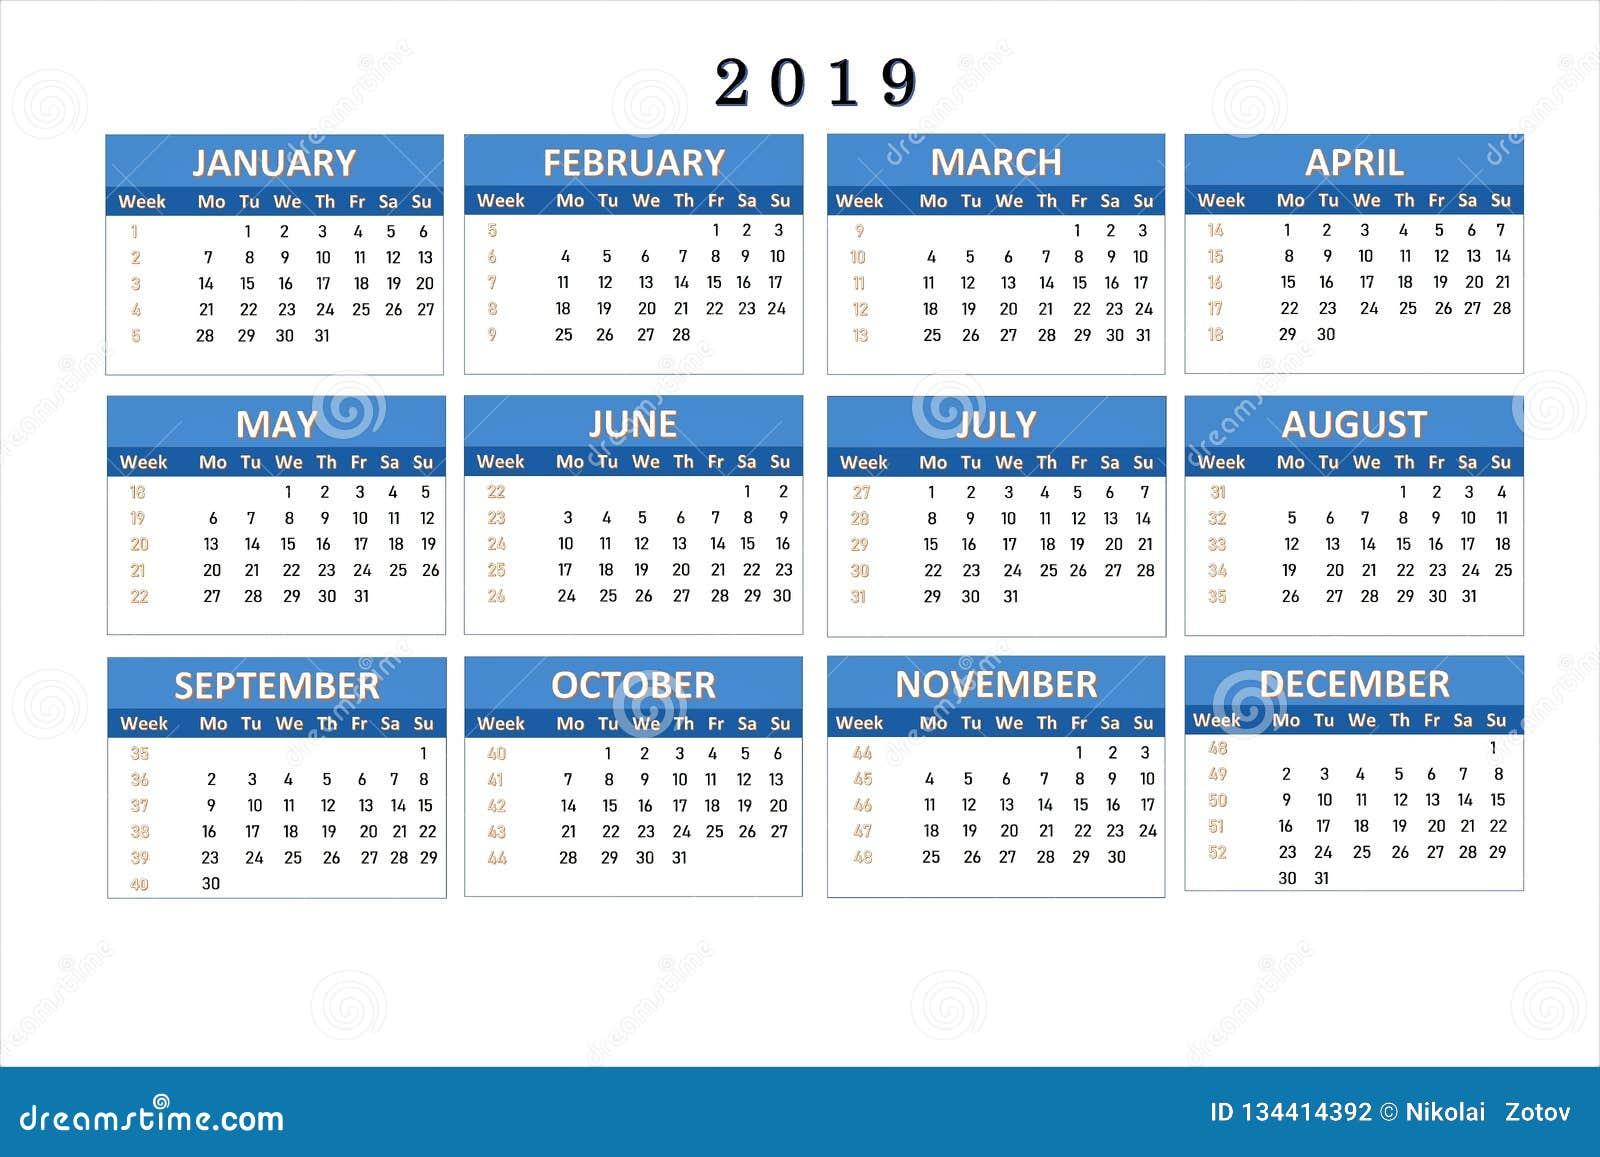 Work Calendar 2019 Calendar For 2019 For Notes And Office Work. Stock Illustration